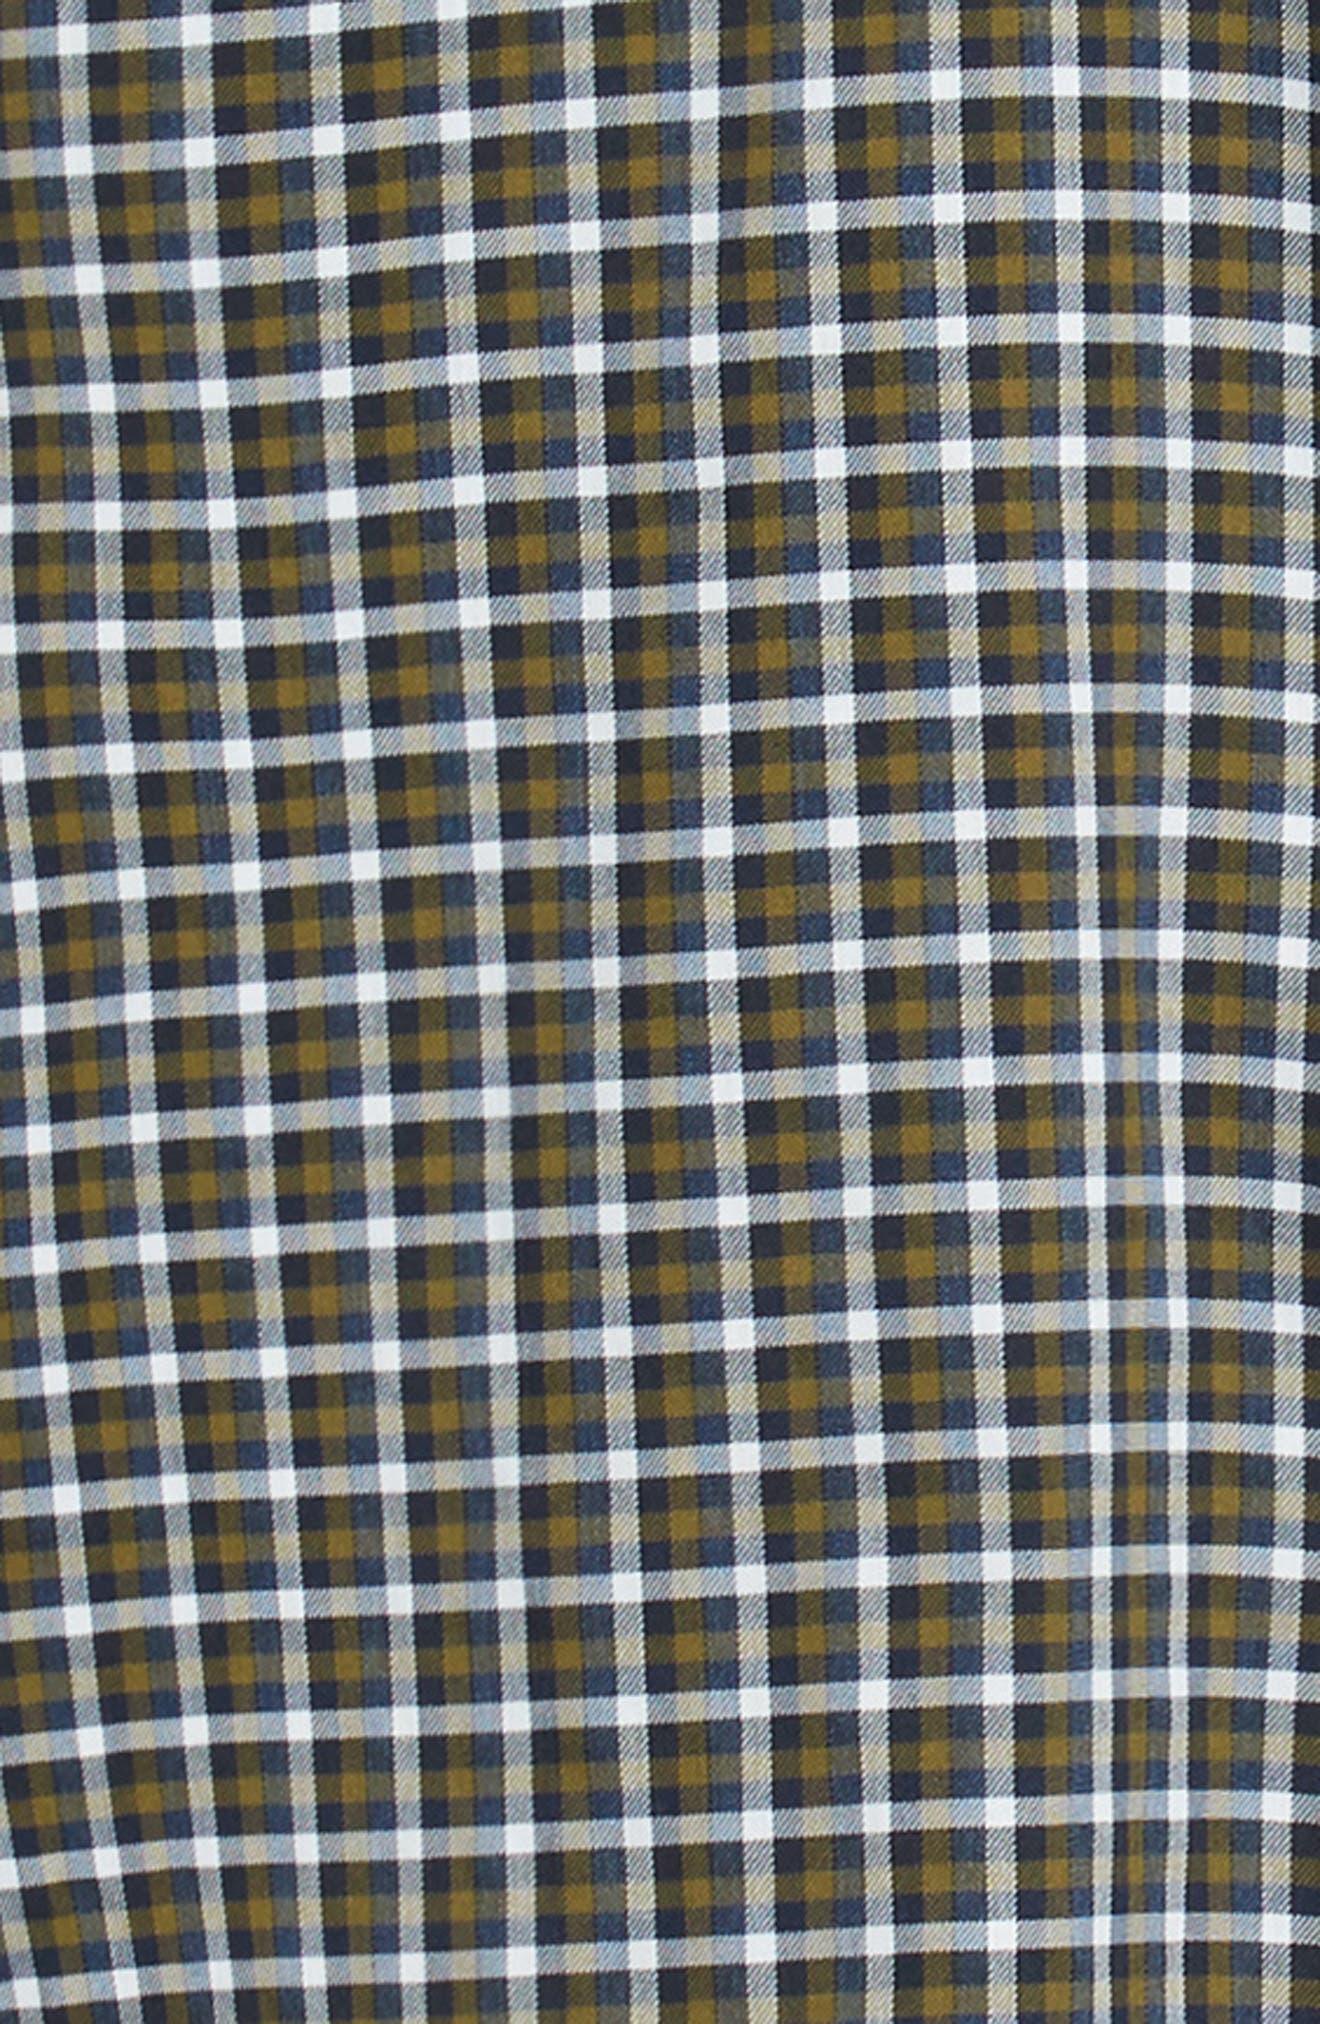 Tech-Smart Slim Fit Check Sport Shirt,                             Alternate thumbnail 6, color,                             NAVY NIGHT OLIVE CHECK